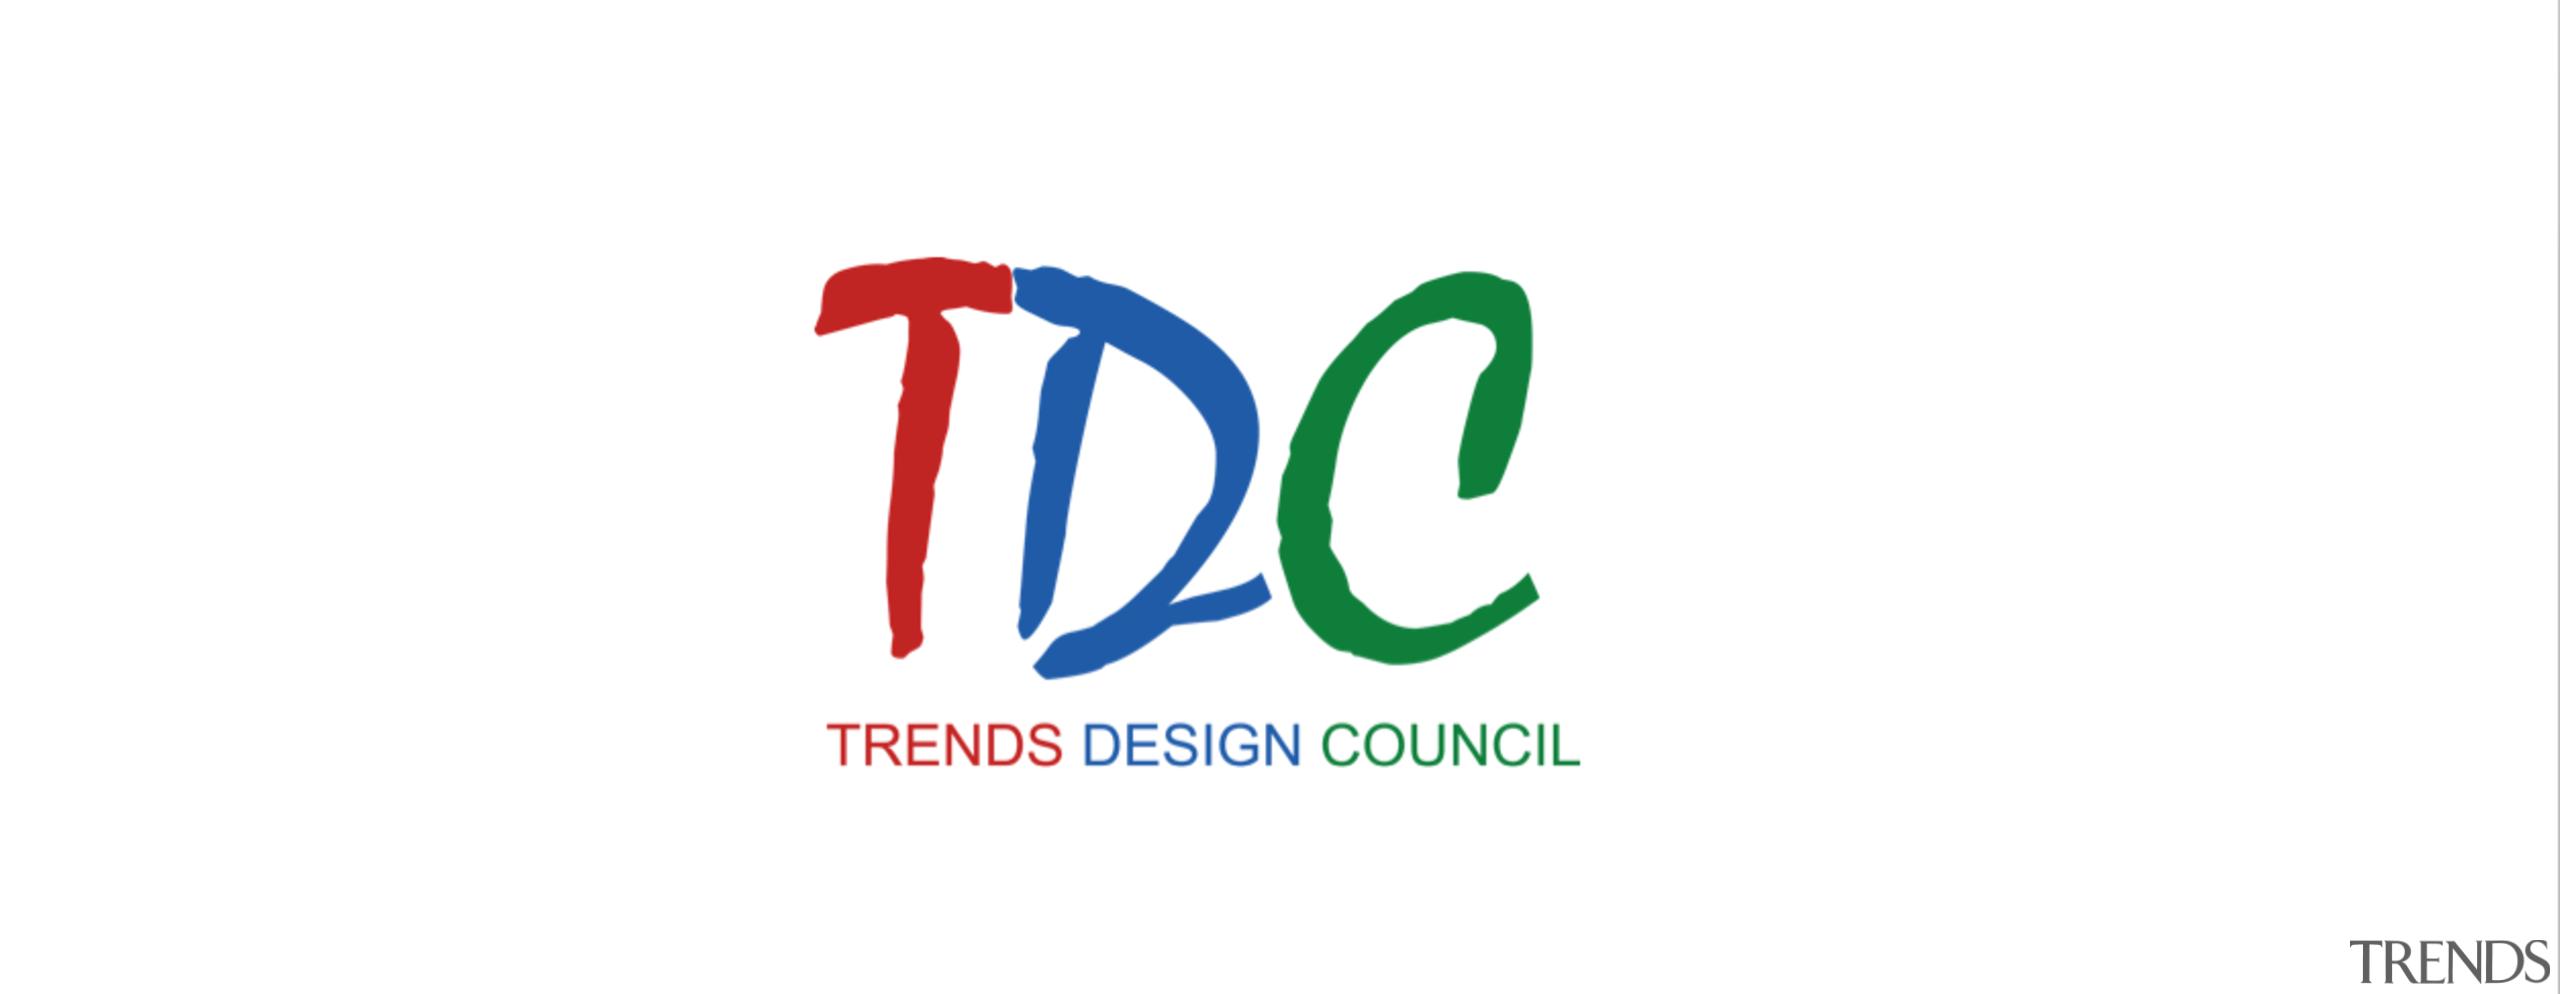 TDC Banner - brand   font   graphics brand, font, graphics, line, logo, text, trademark, white